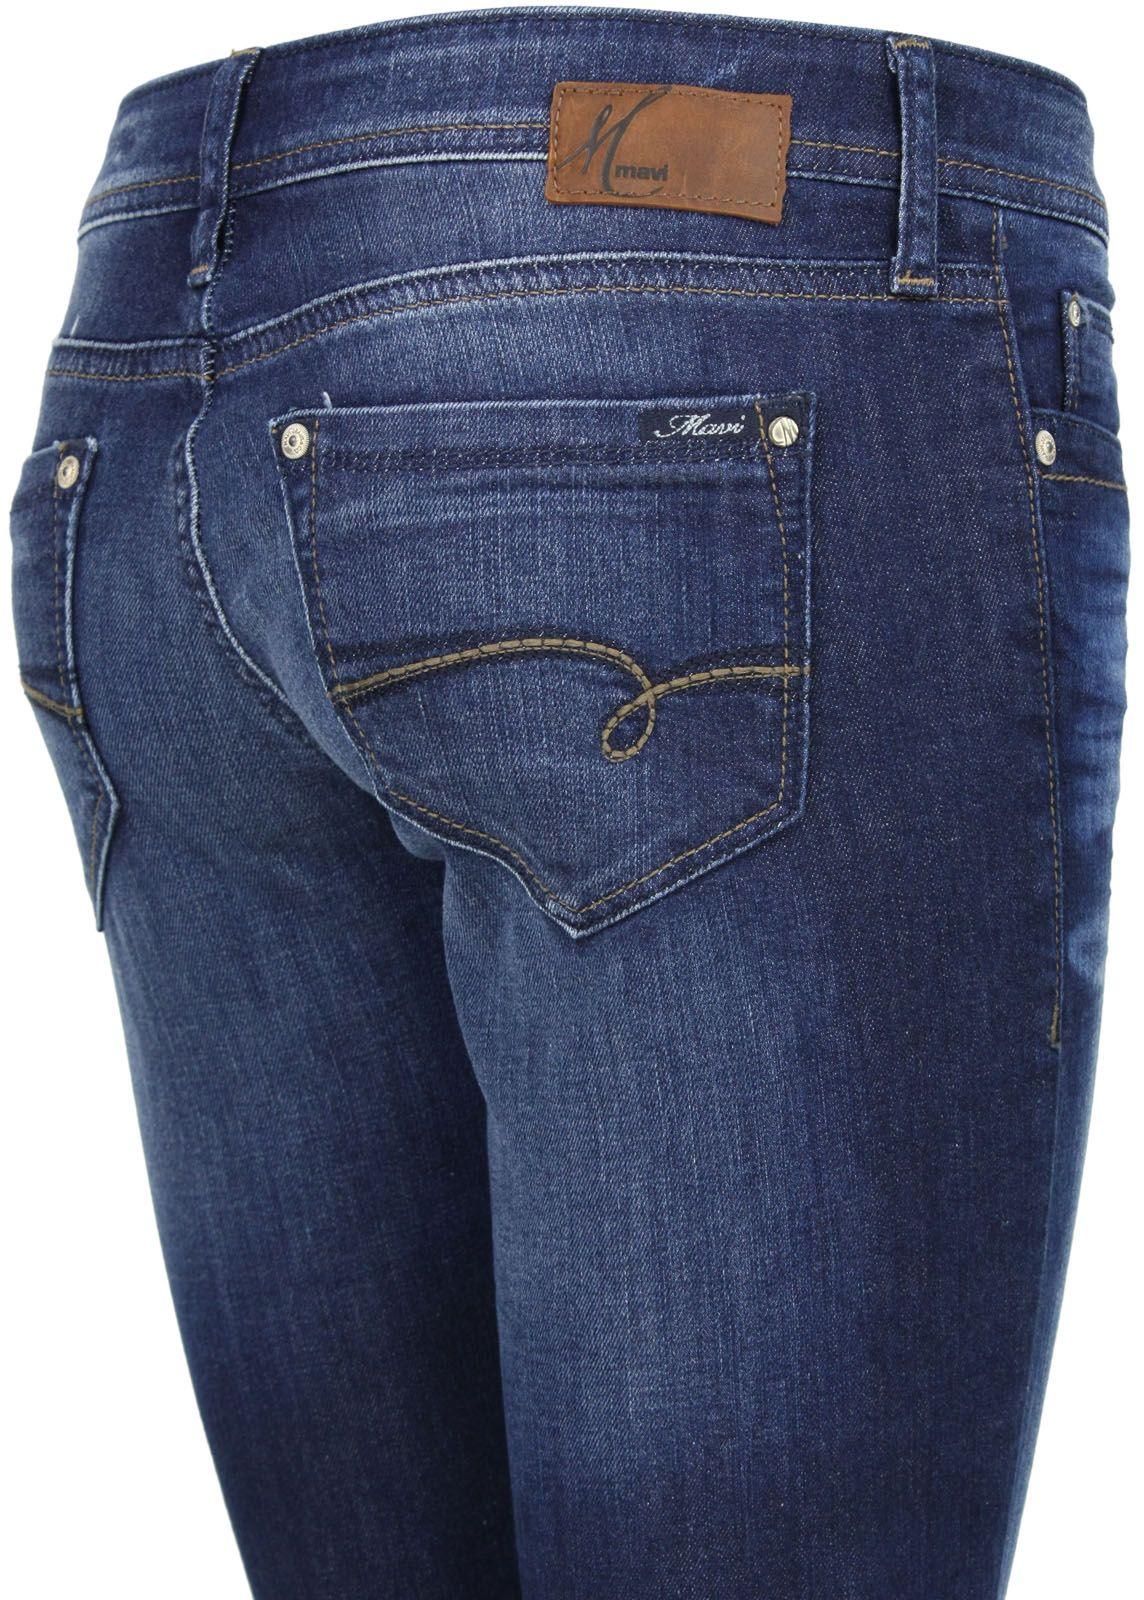 mavi jeans olivia dark soho fettebeute online shop. Black Bedroom Furniture Sets. Home Design Ideas